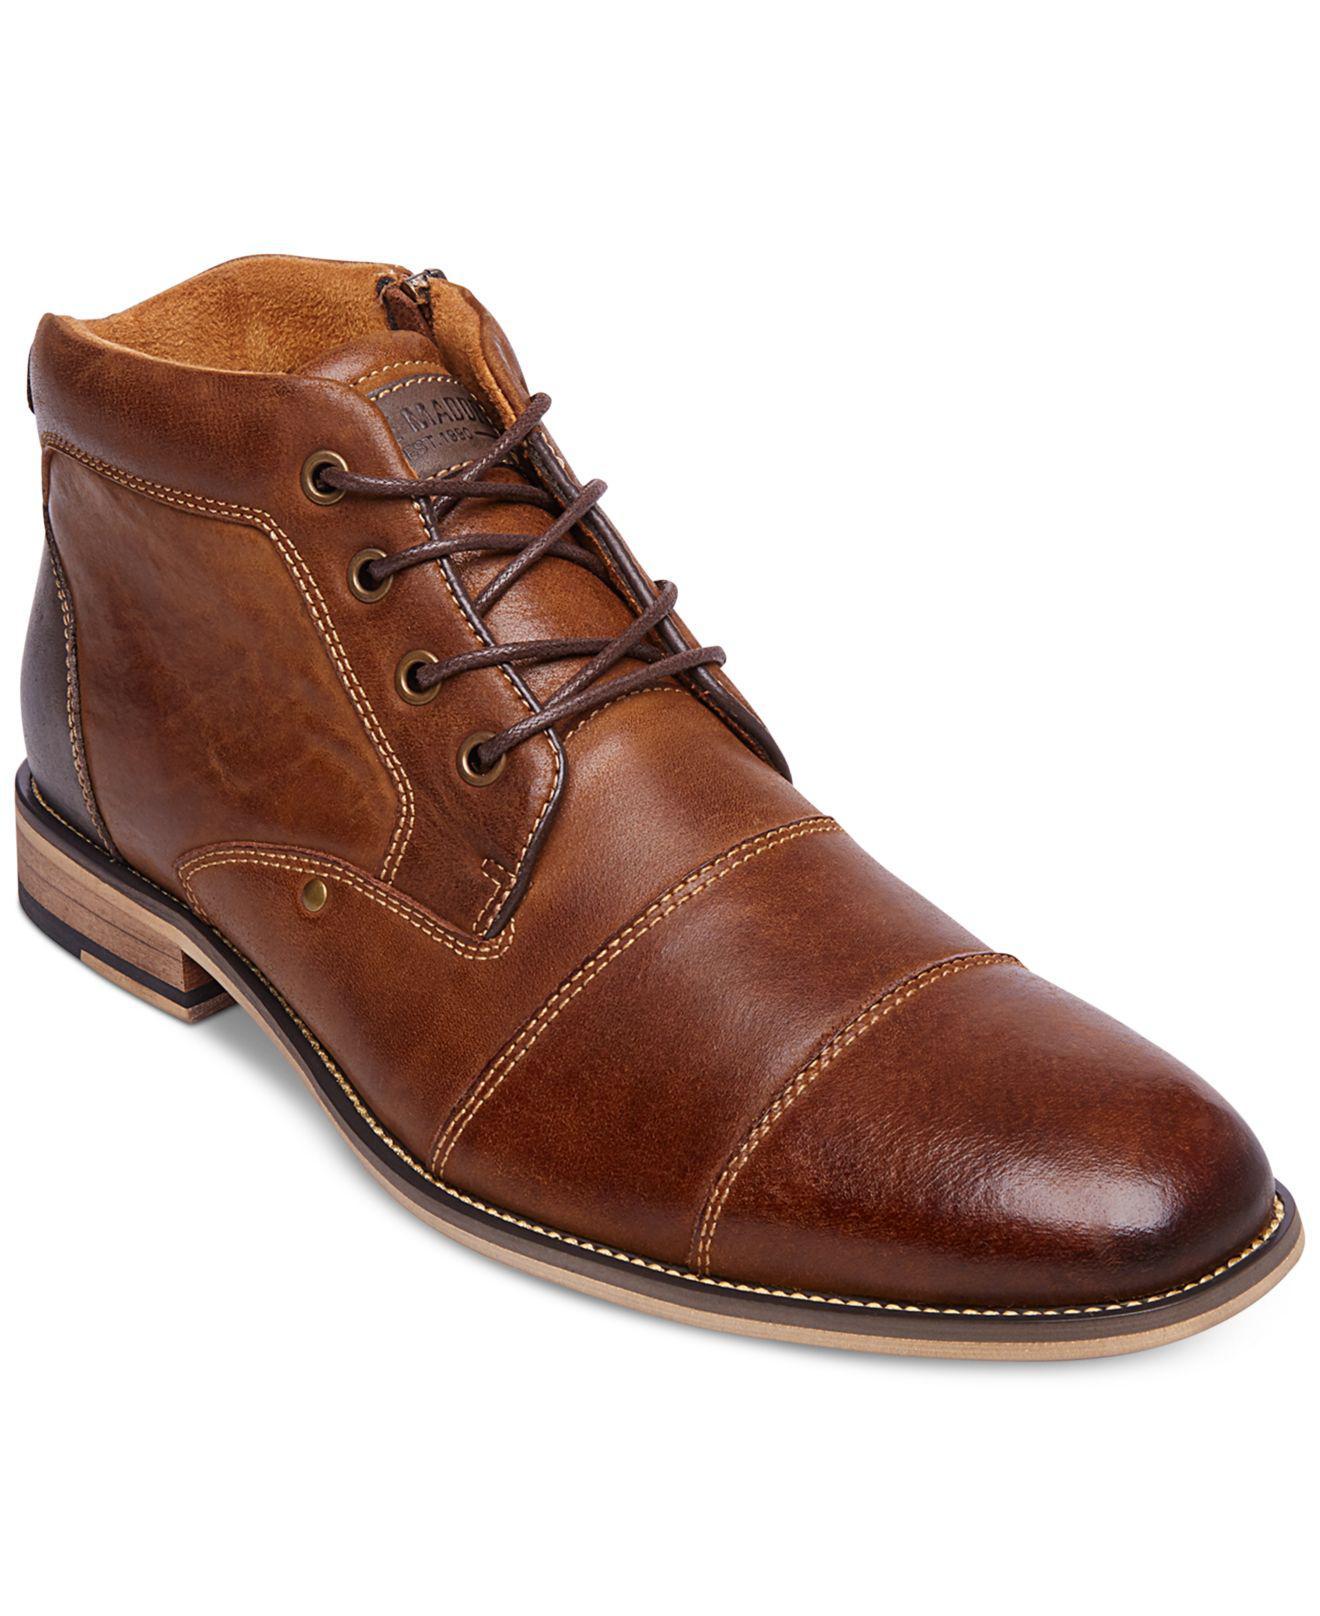 Steve Madden. Brown Men's Jonnie Excel Boots